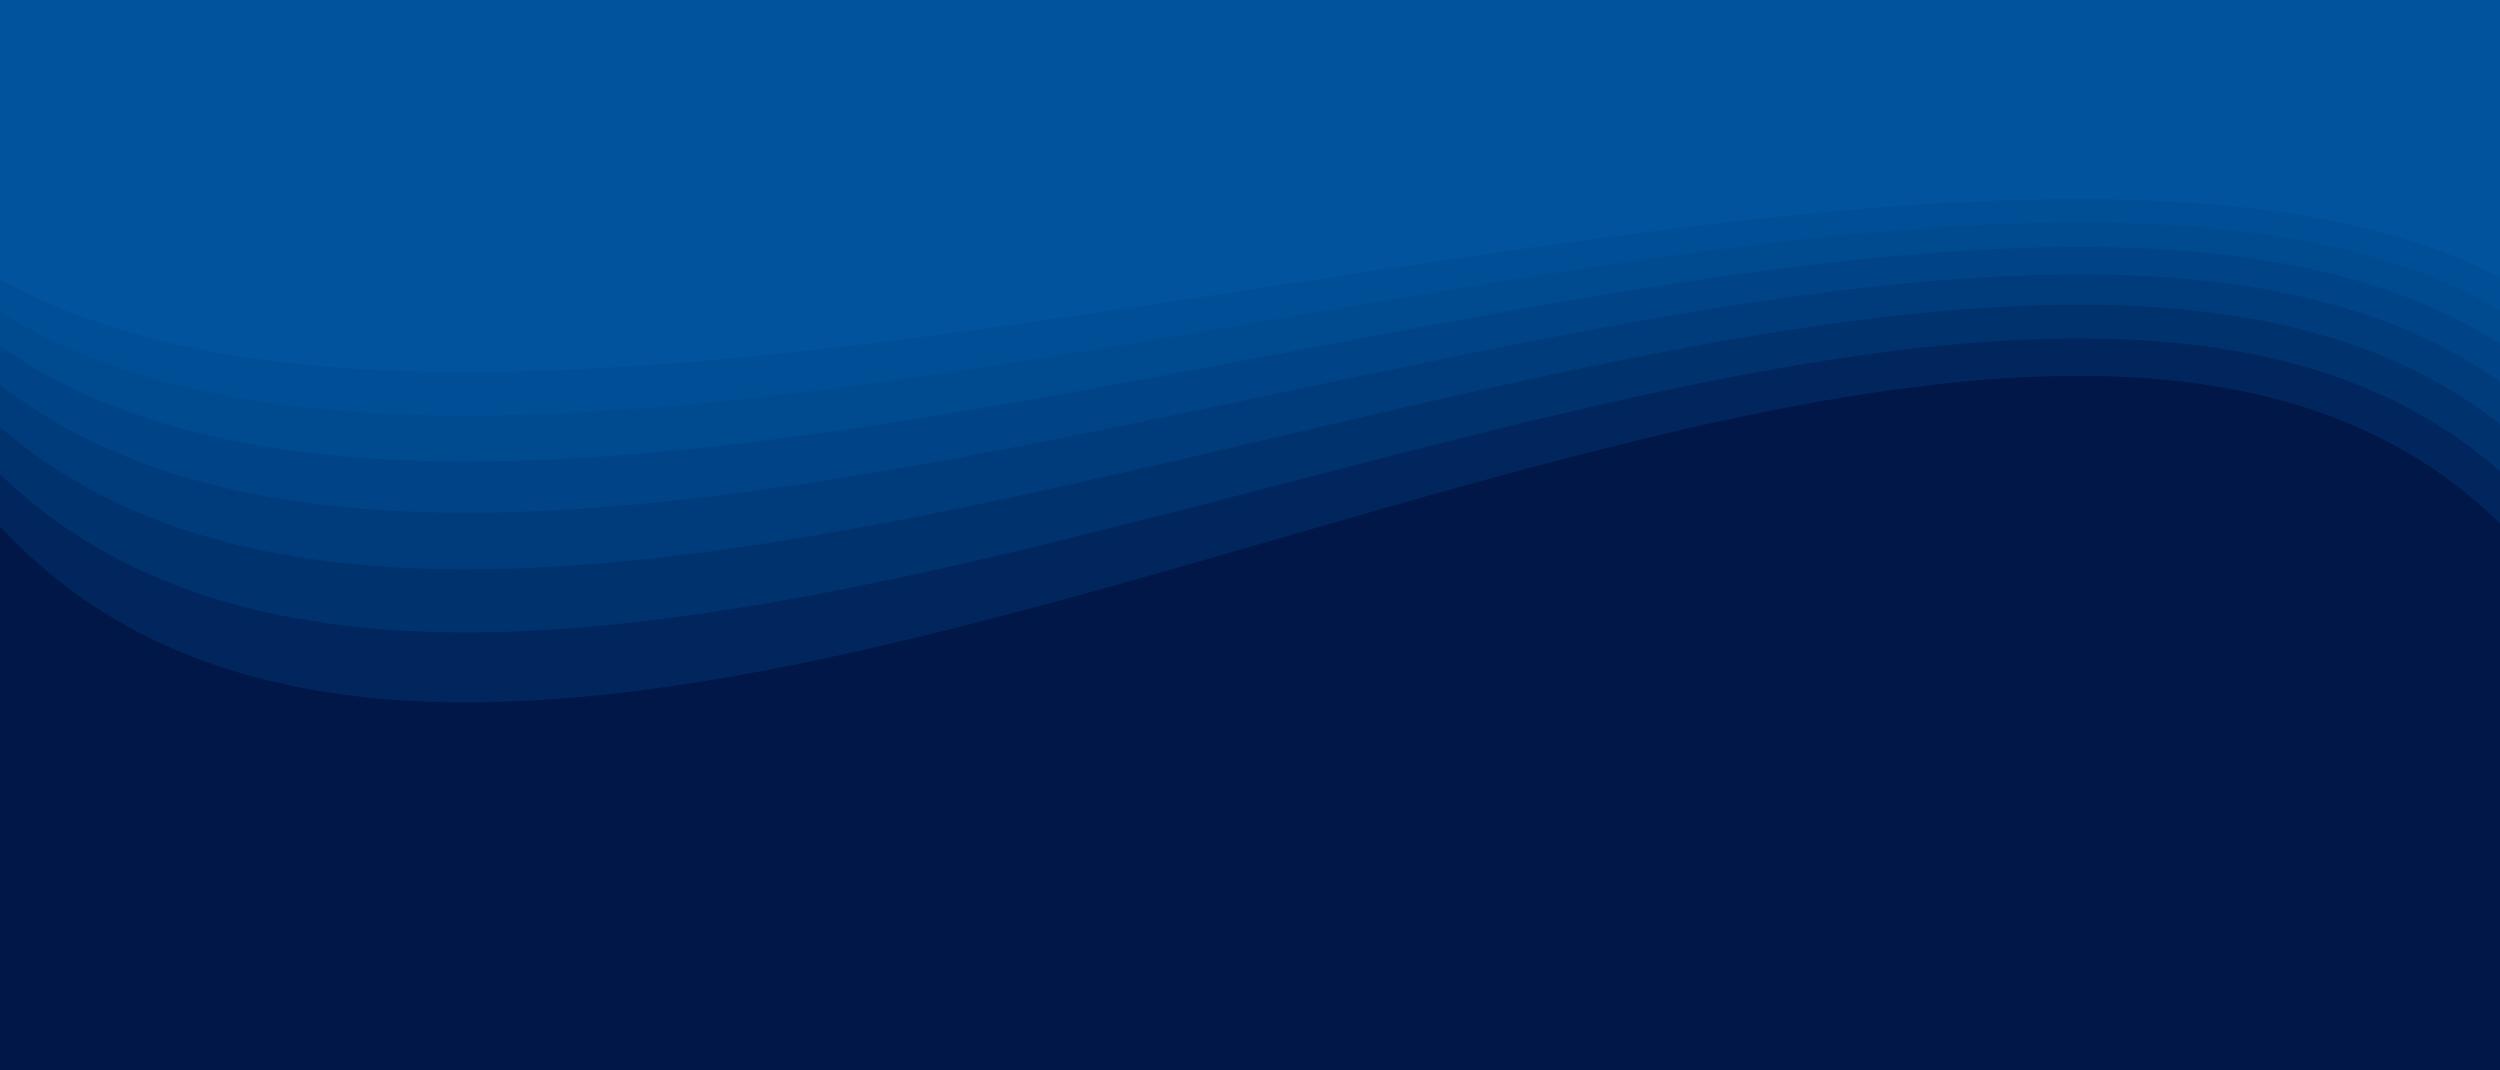 Clipart Waves Abstract Clipart Waves Abstract Transparent